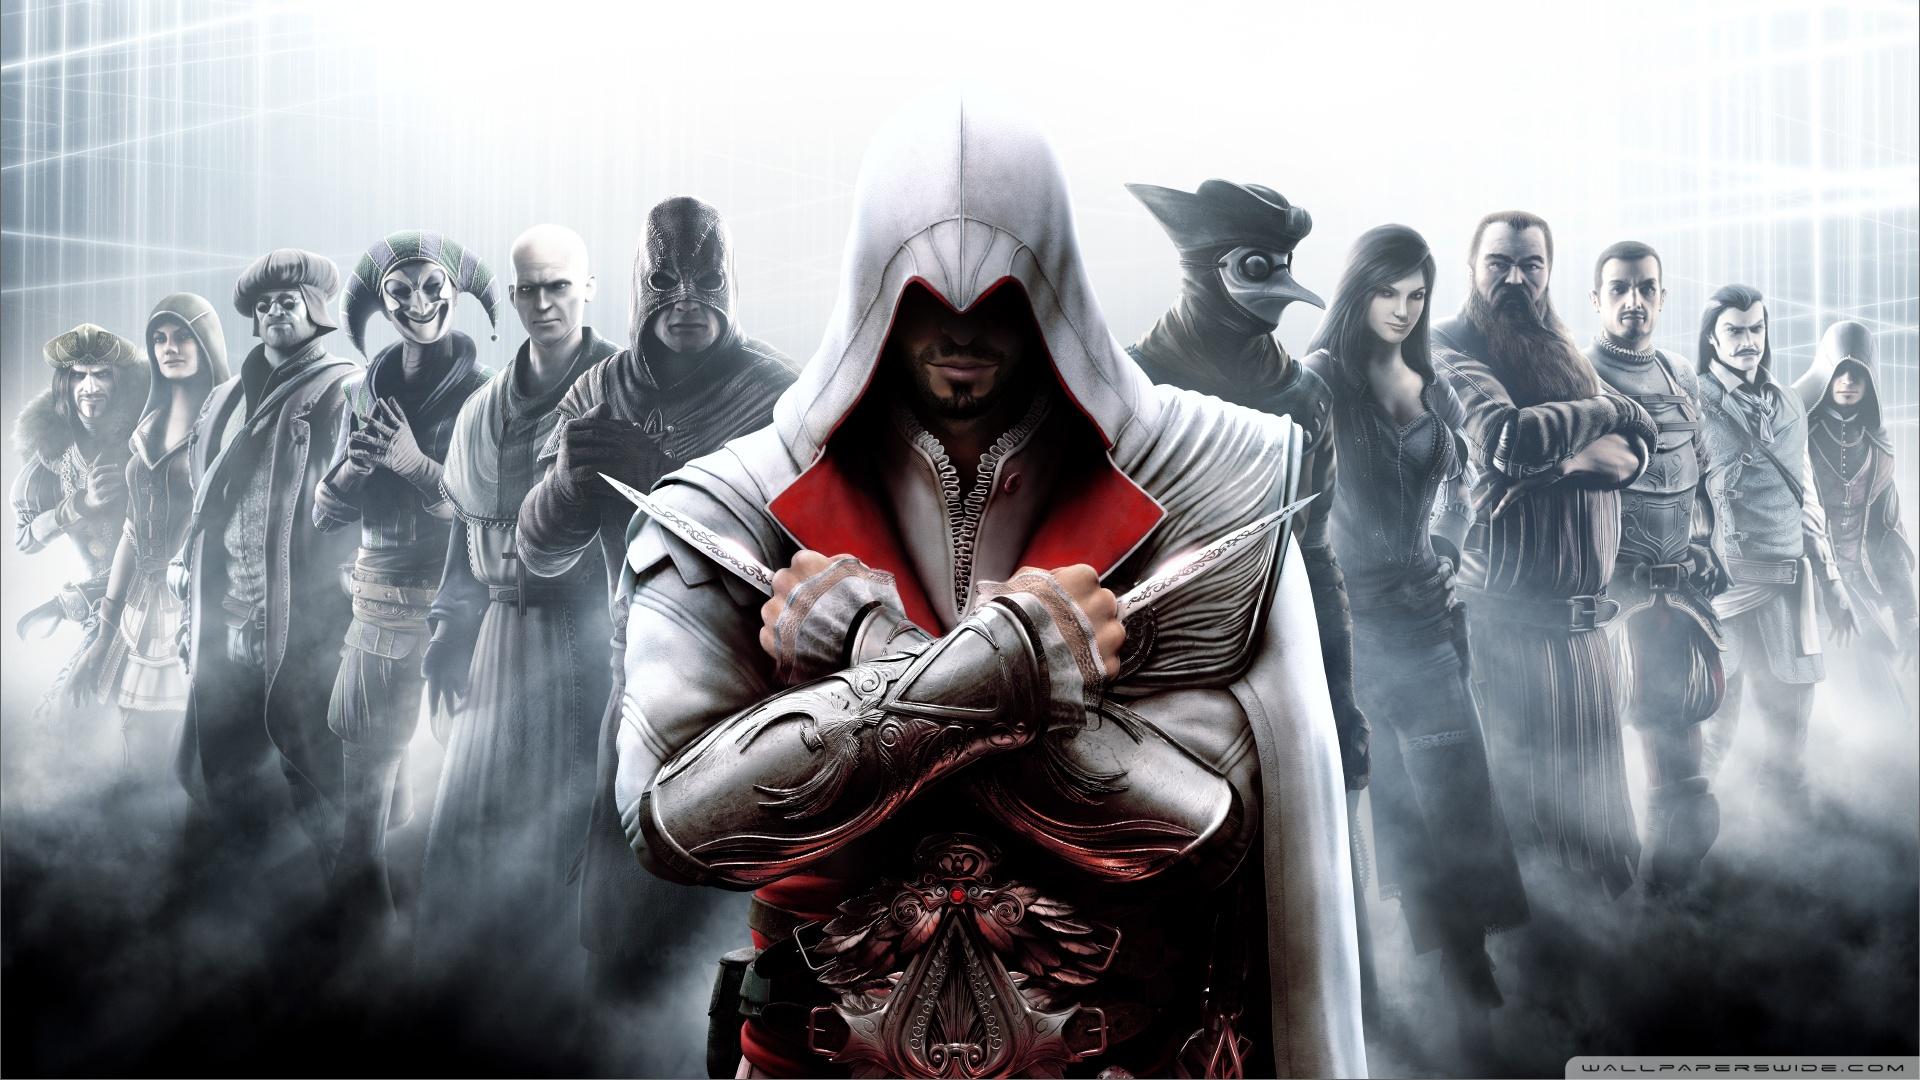 Ezio Wallpaper 25904 1920x1200 px